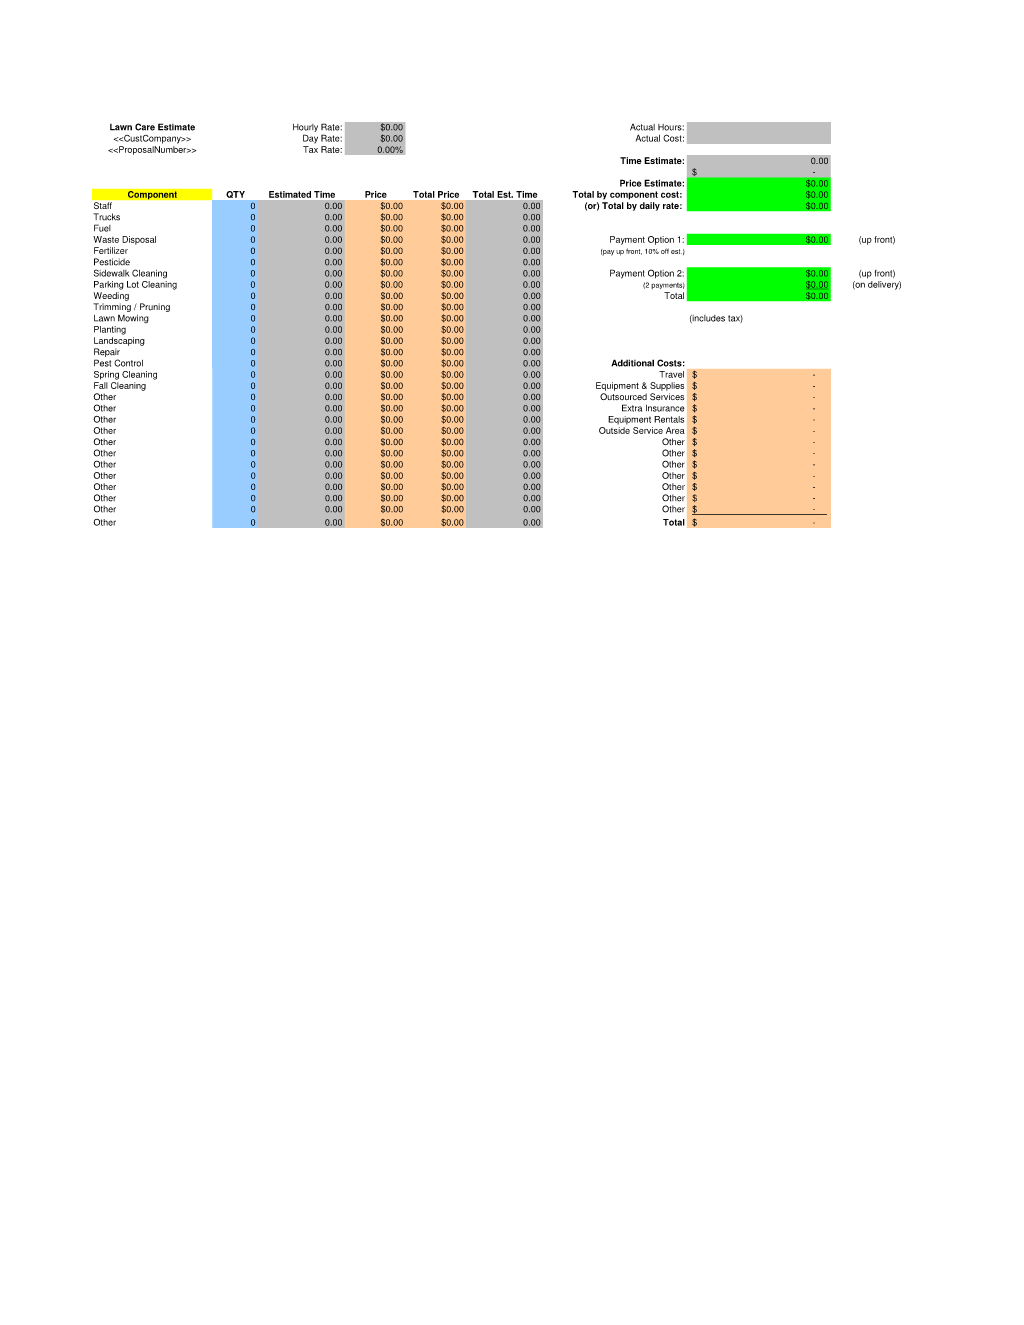 Lawn Care Estimate Spreadsheet